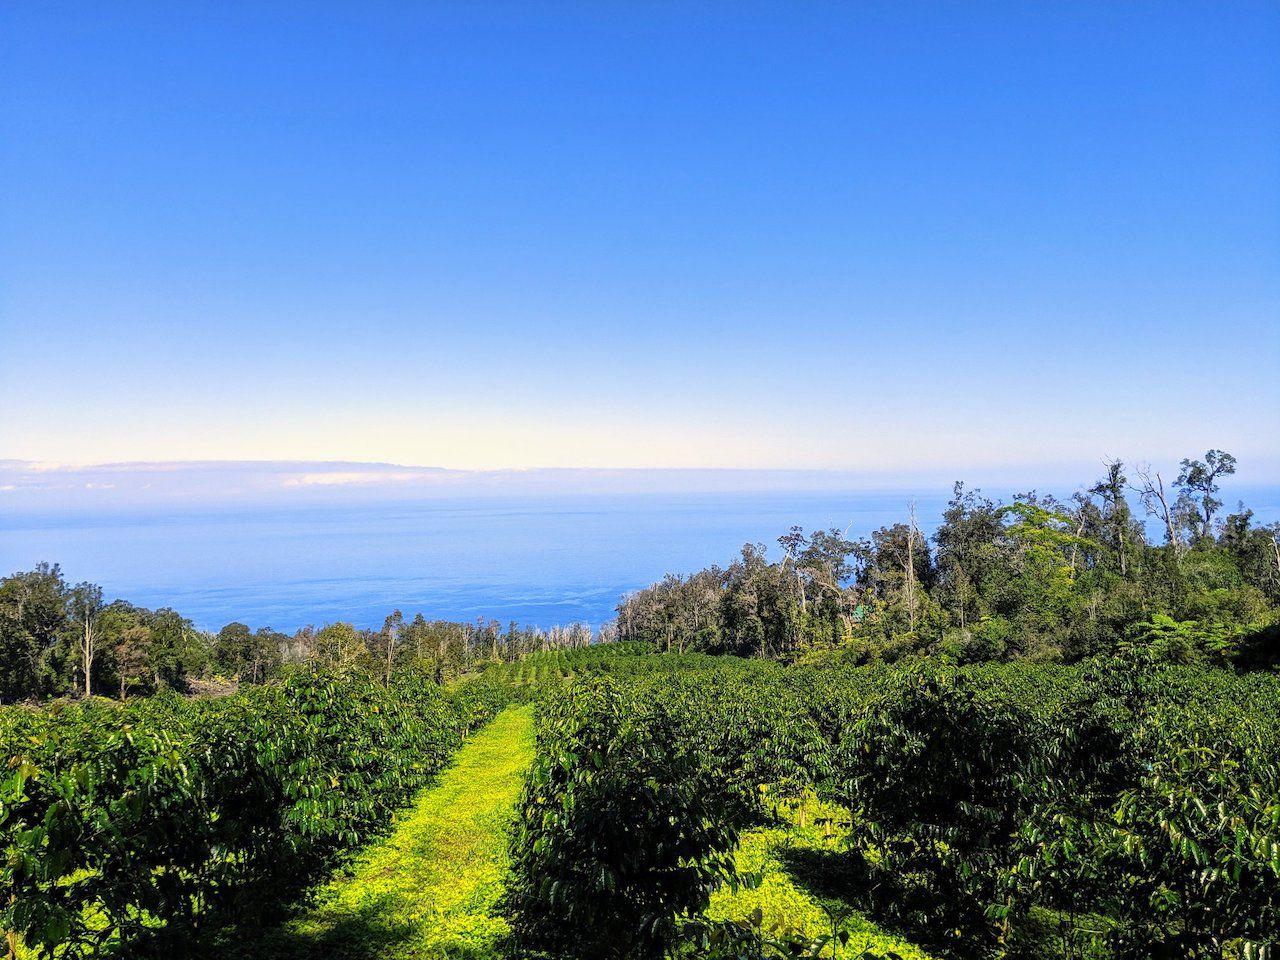 View of the Hala tree Coffee Farm in Hawaii